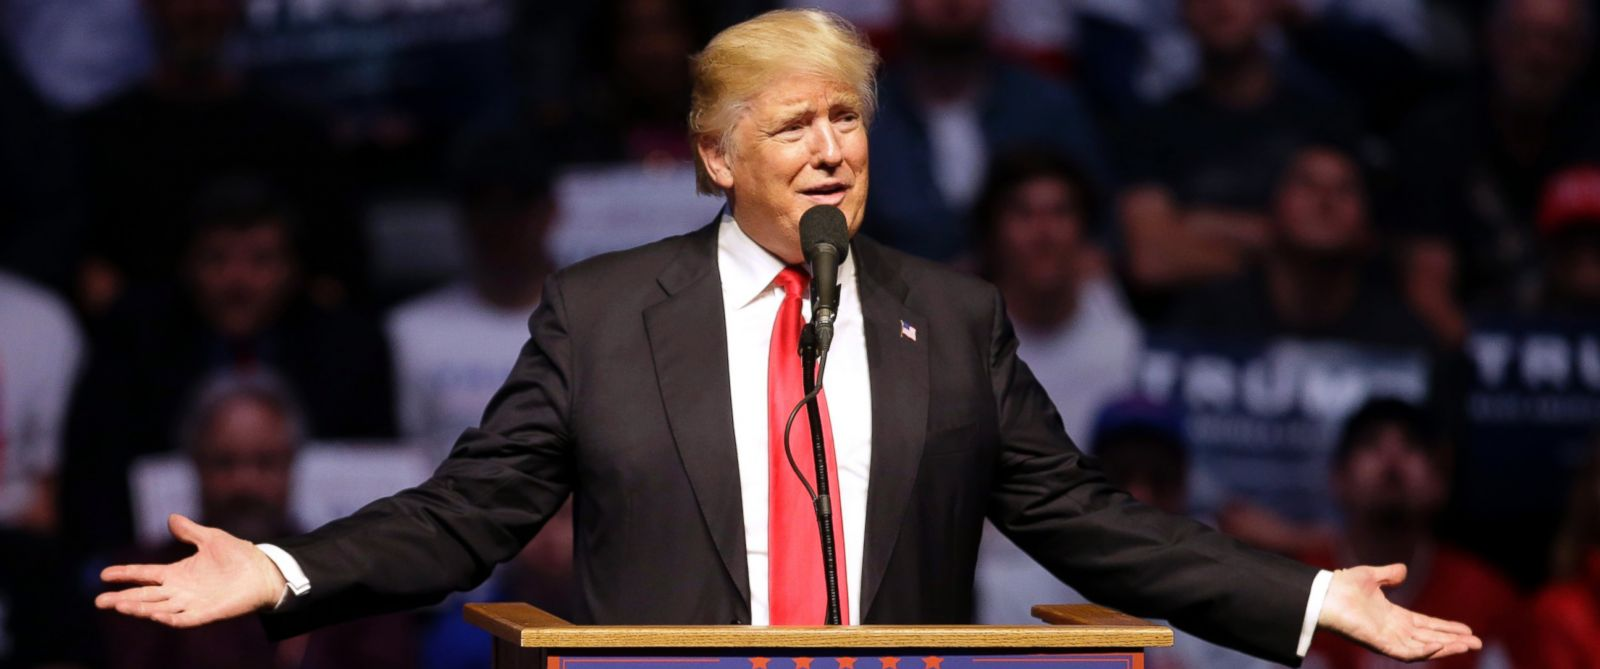 Donald Trump Slams Ted Cruz for Naming Carly Fiorina as Running Mate